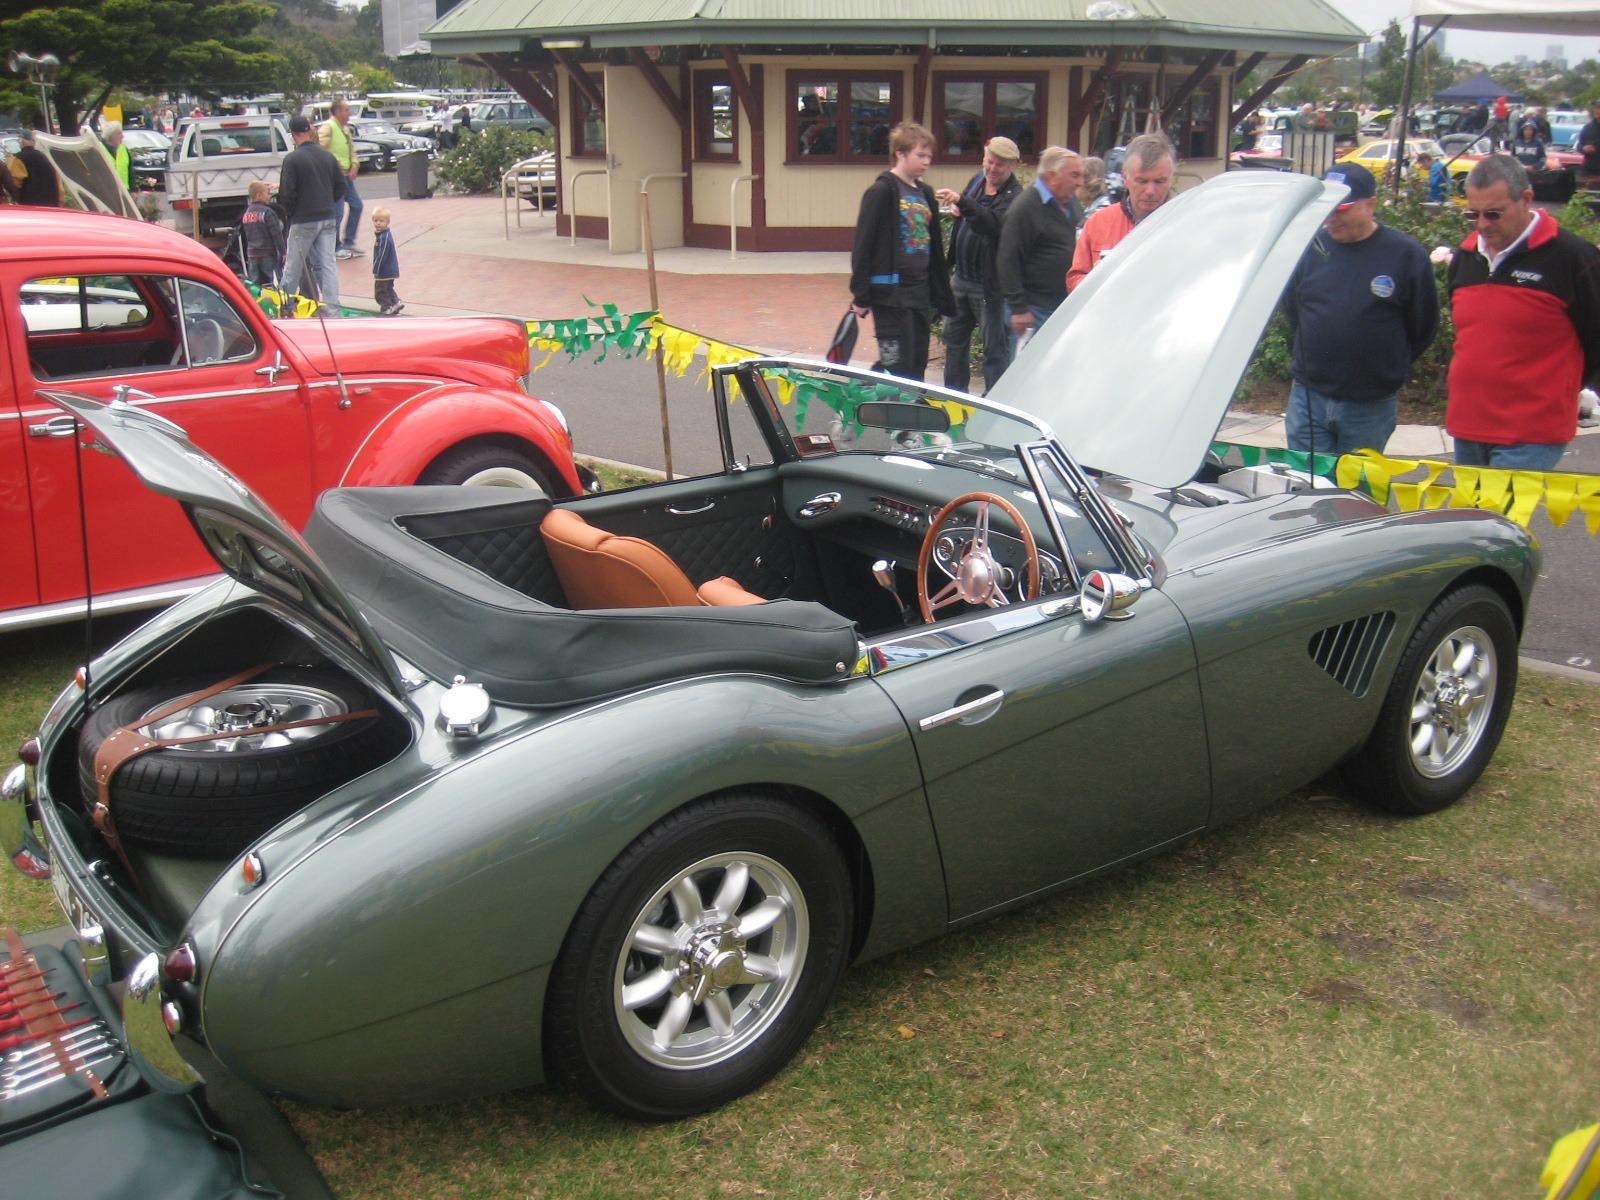 Austin-Healey 3000 V8 - Perfect-4